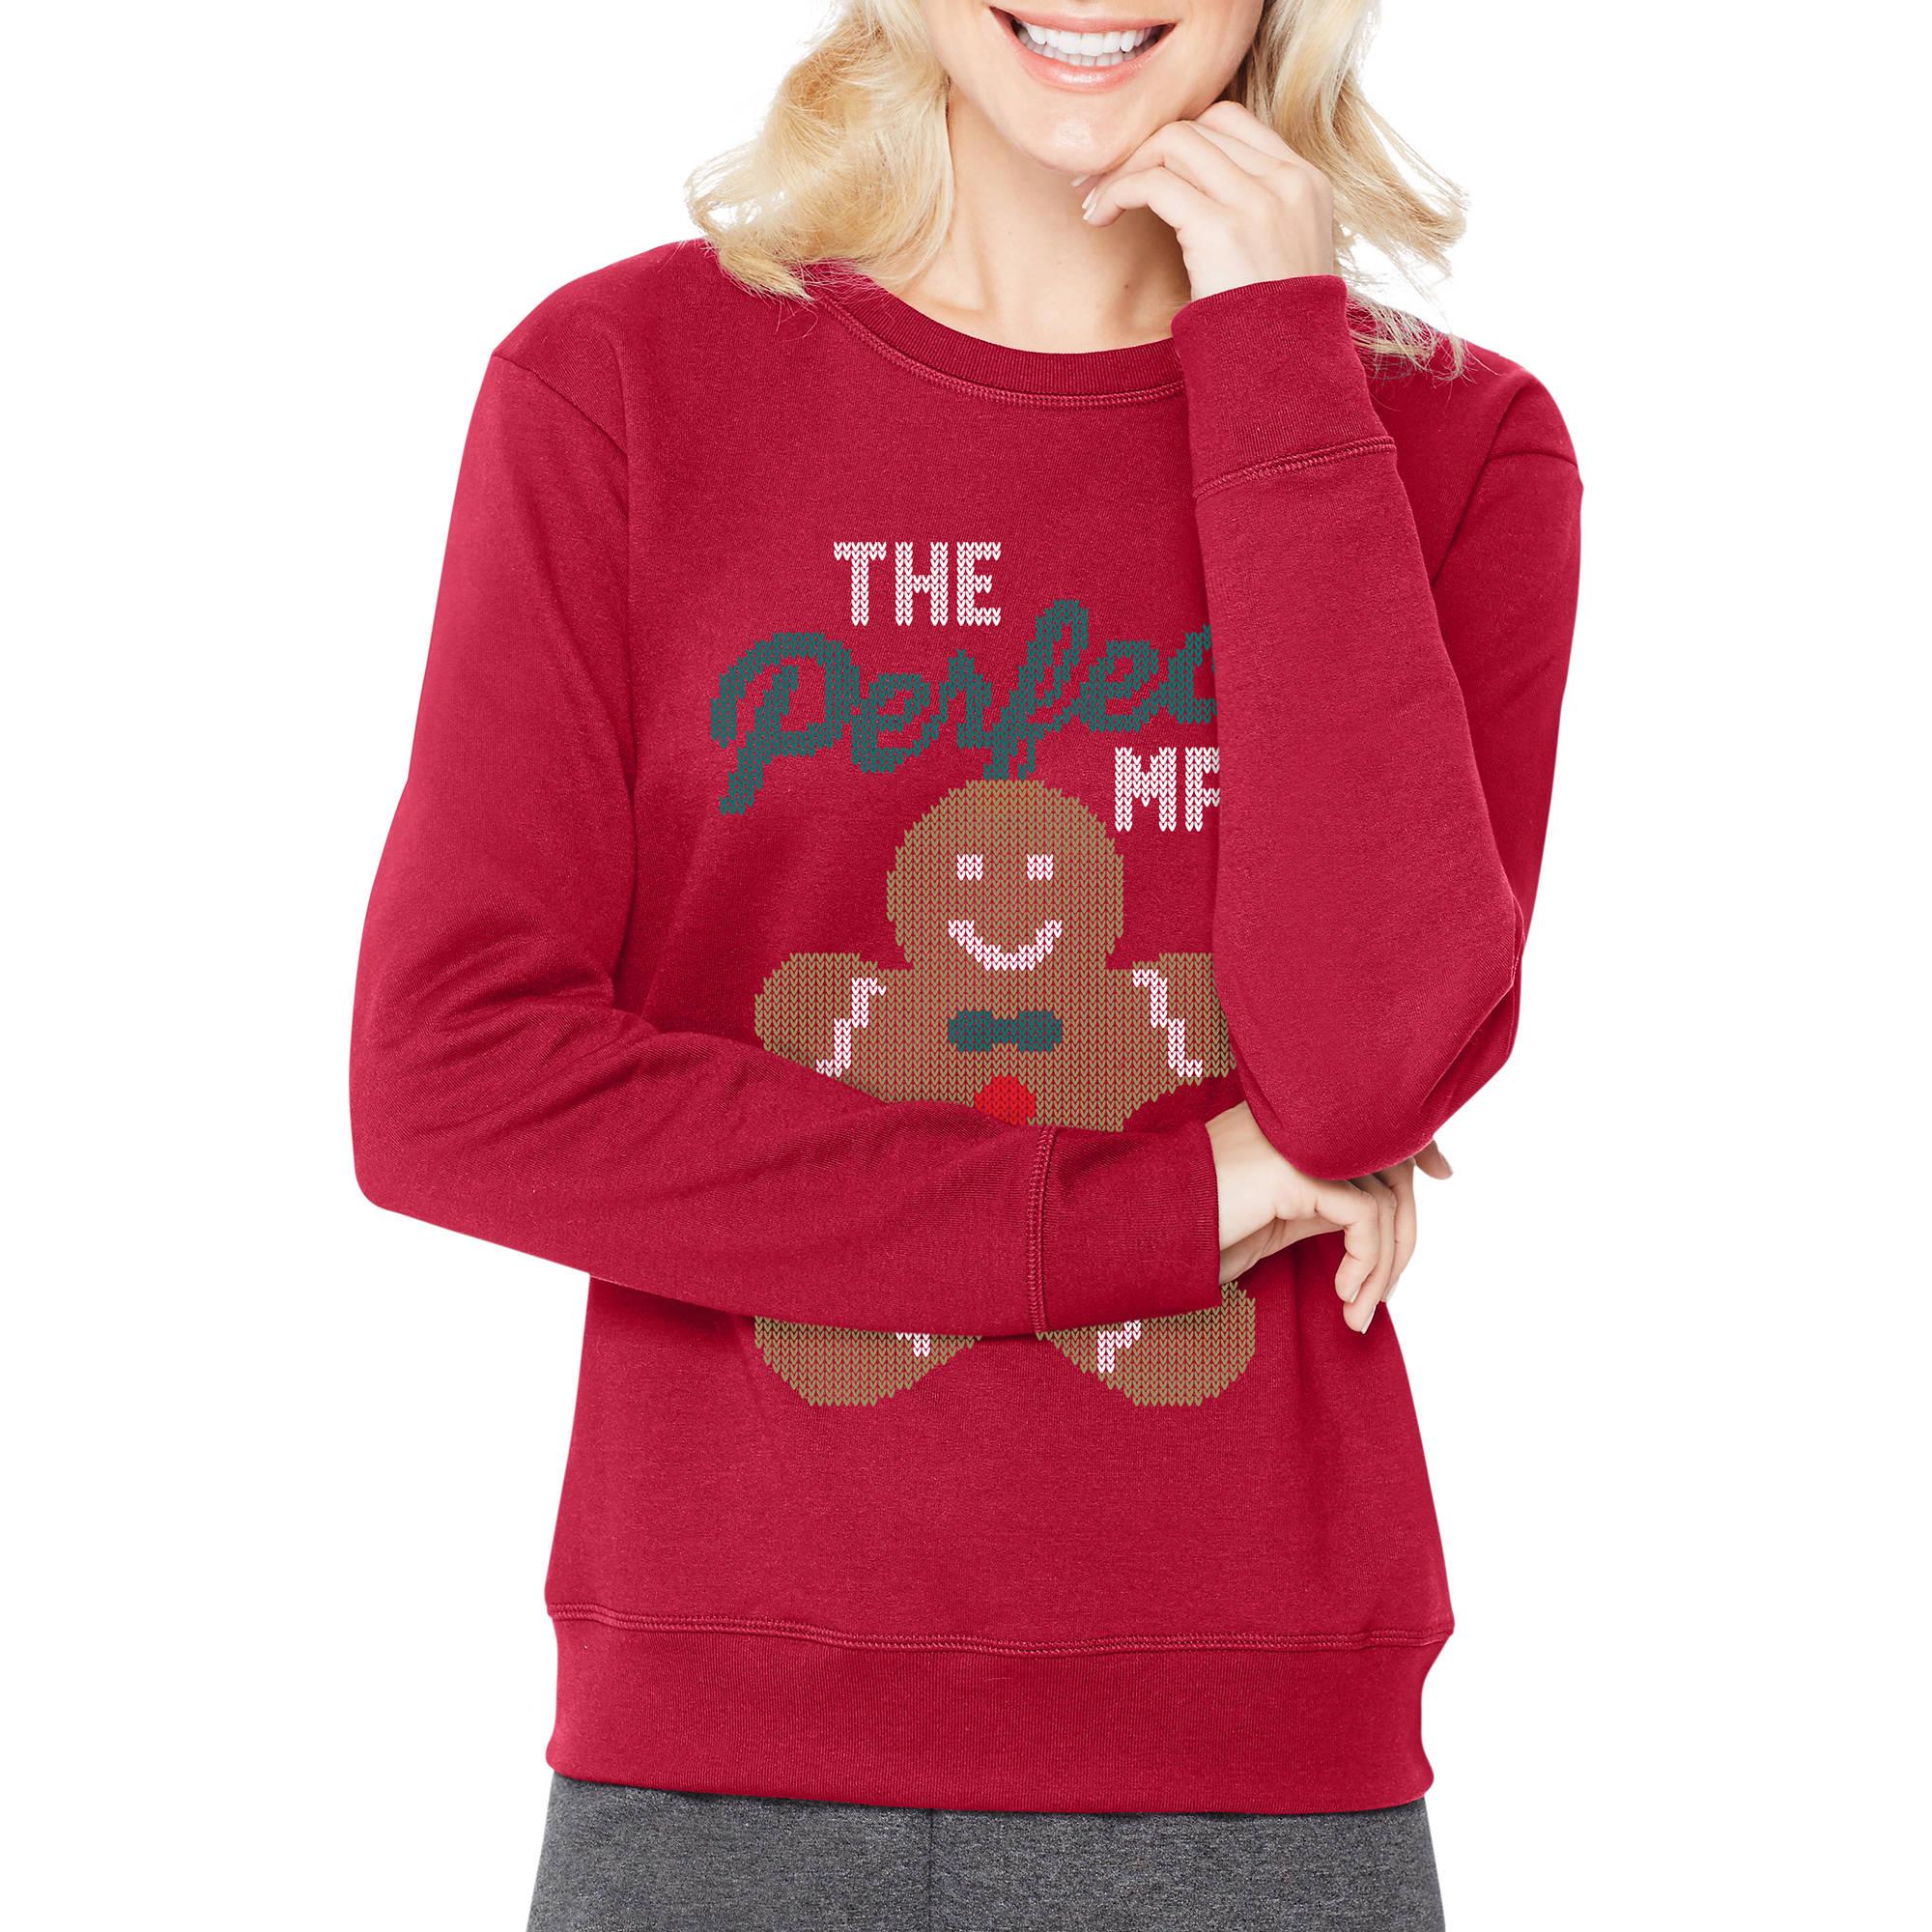 Hanes Women's Christmas Sweatshirt